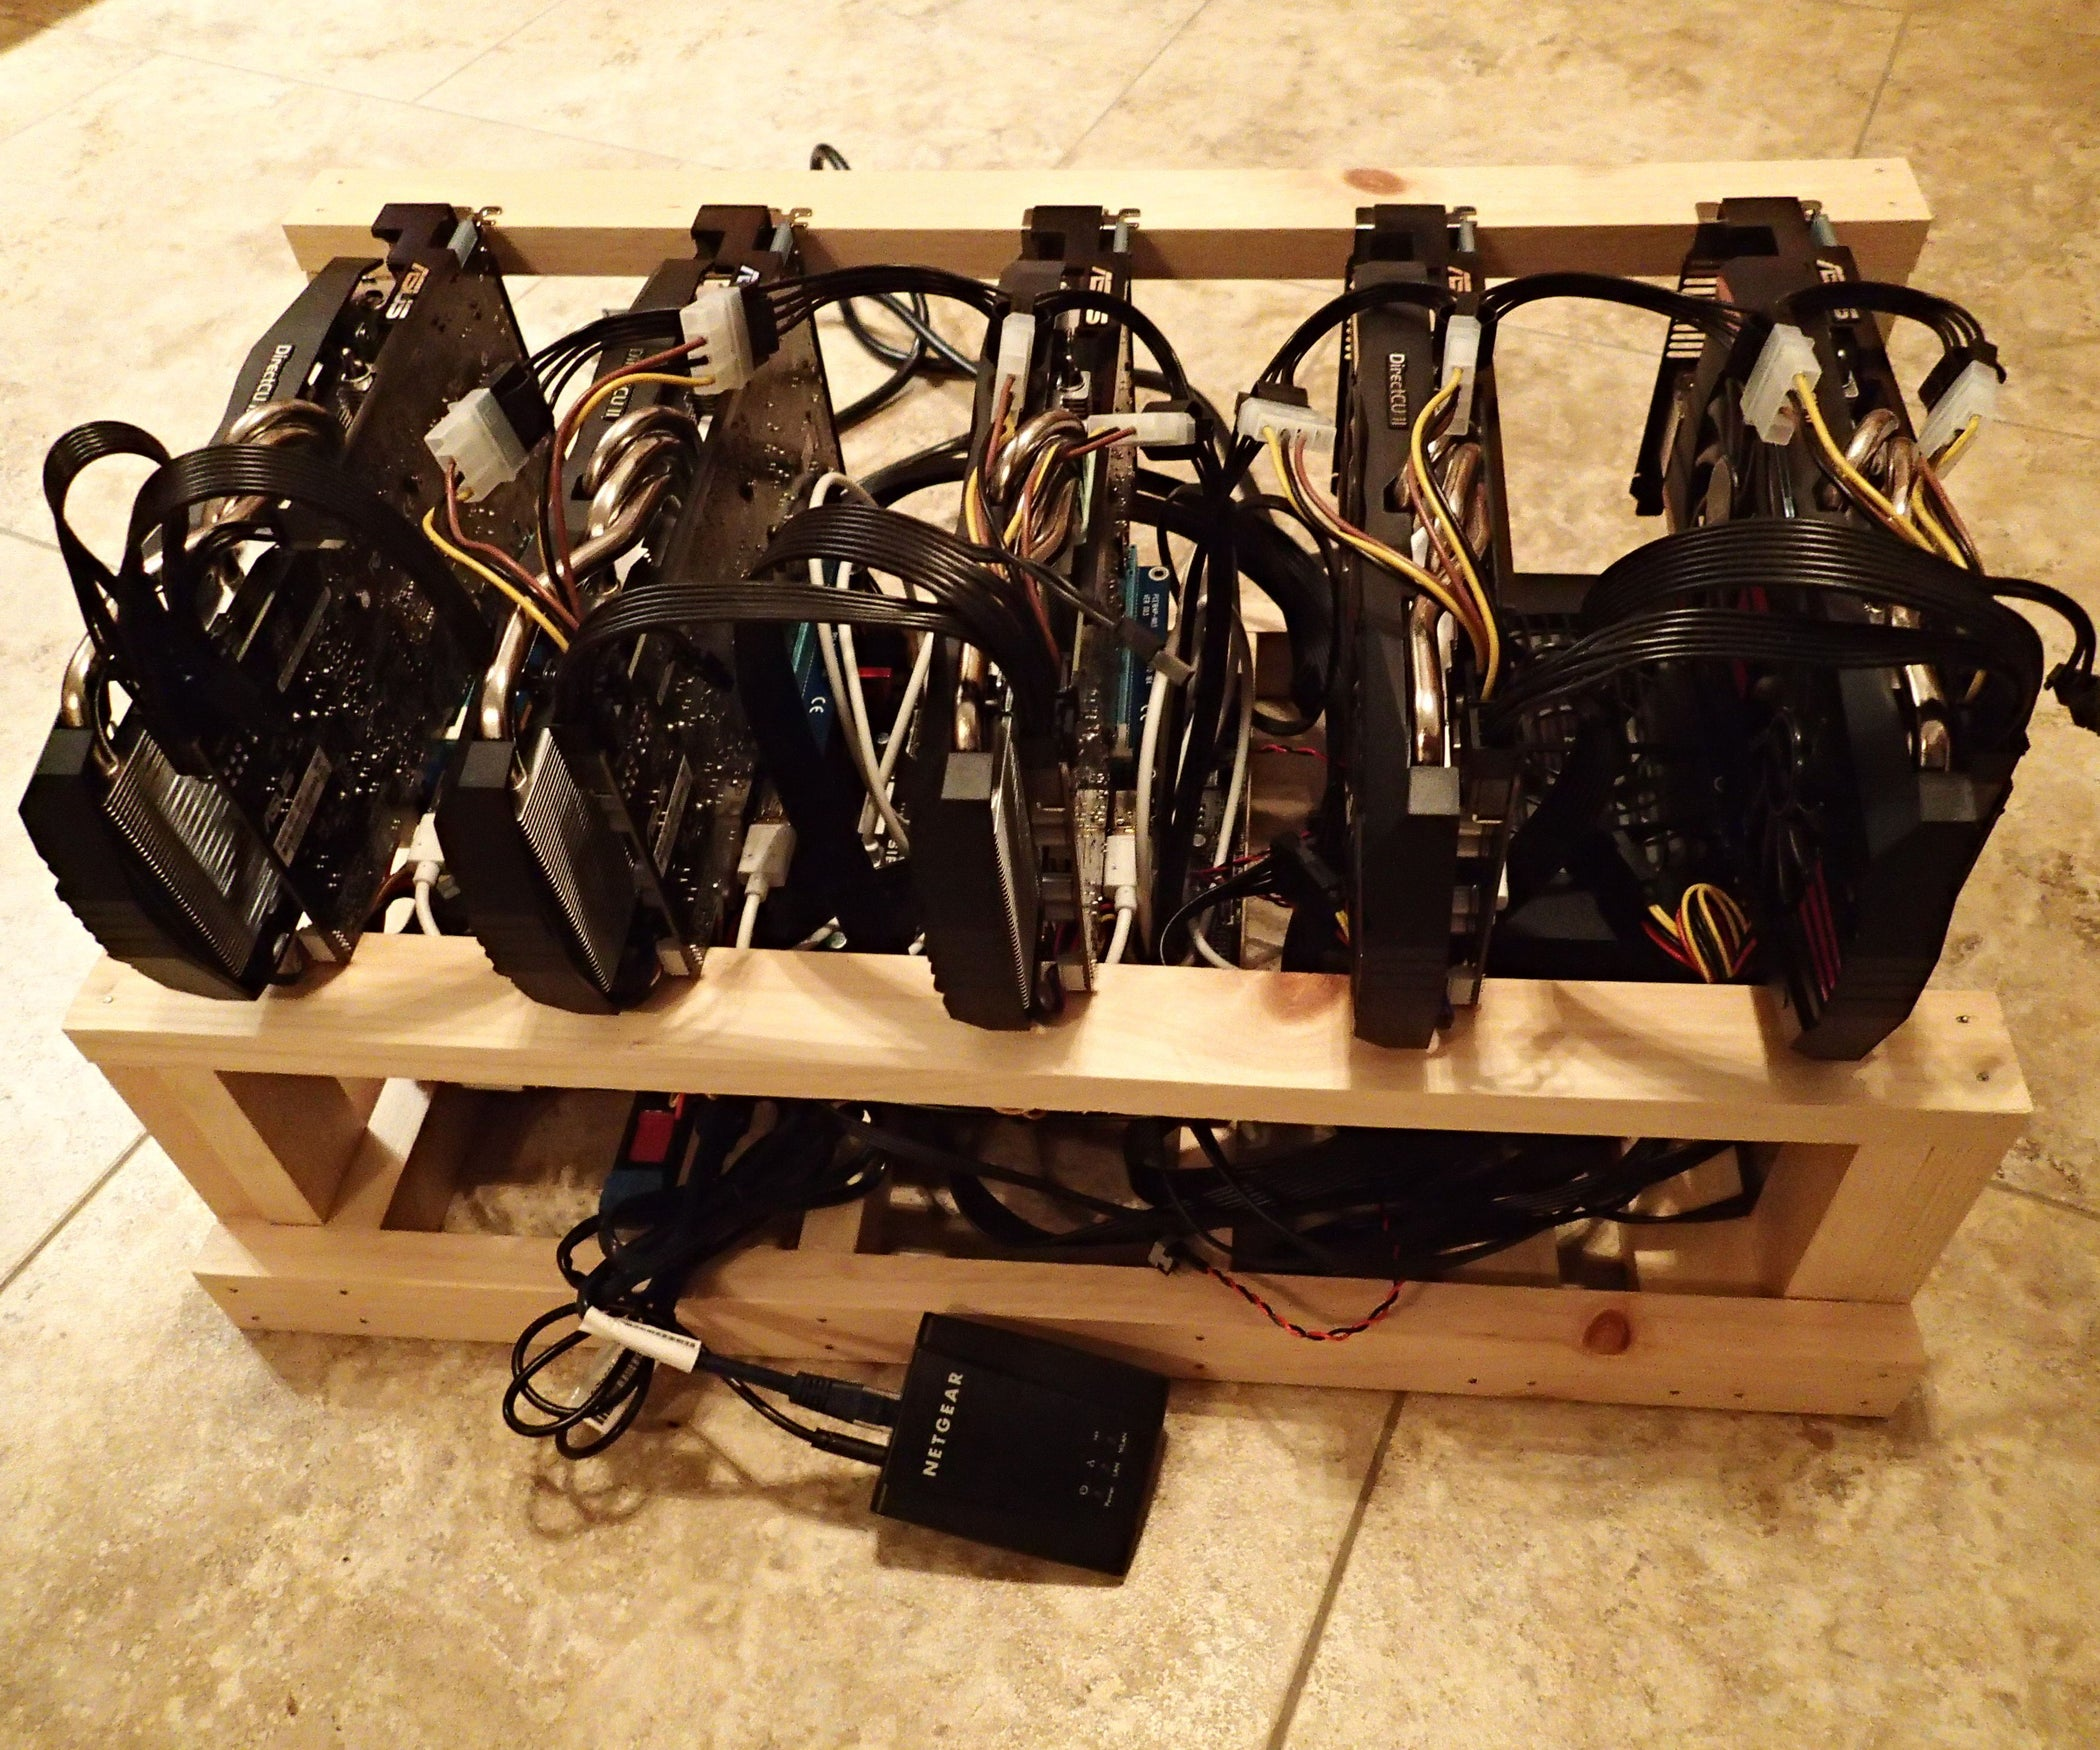 asus r9270x dc2t 2gd5 mining bitcoins